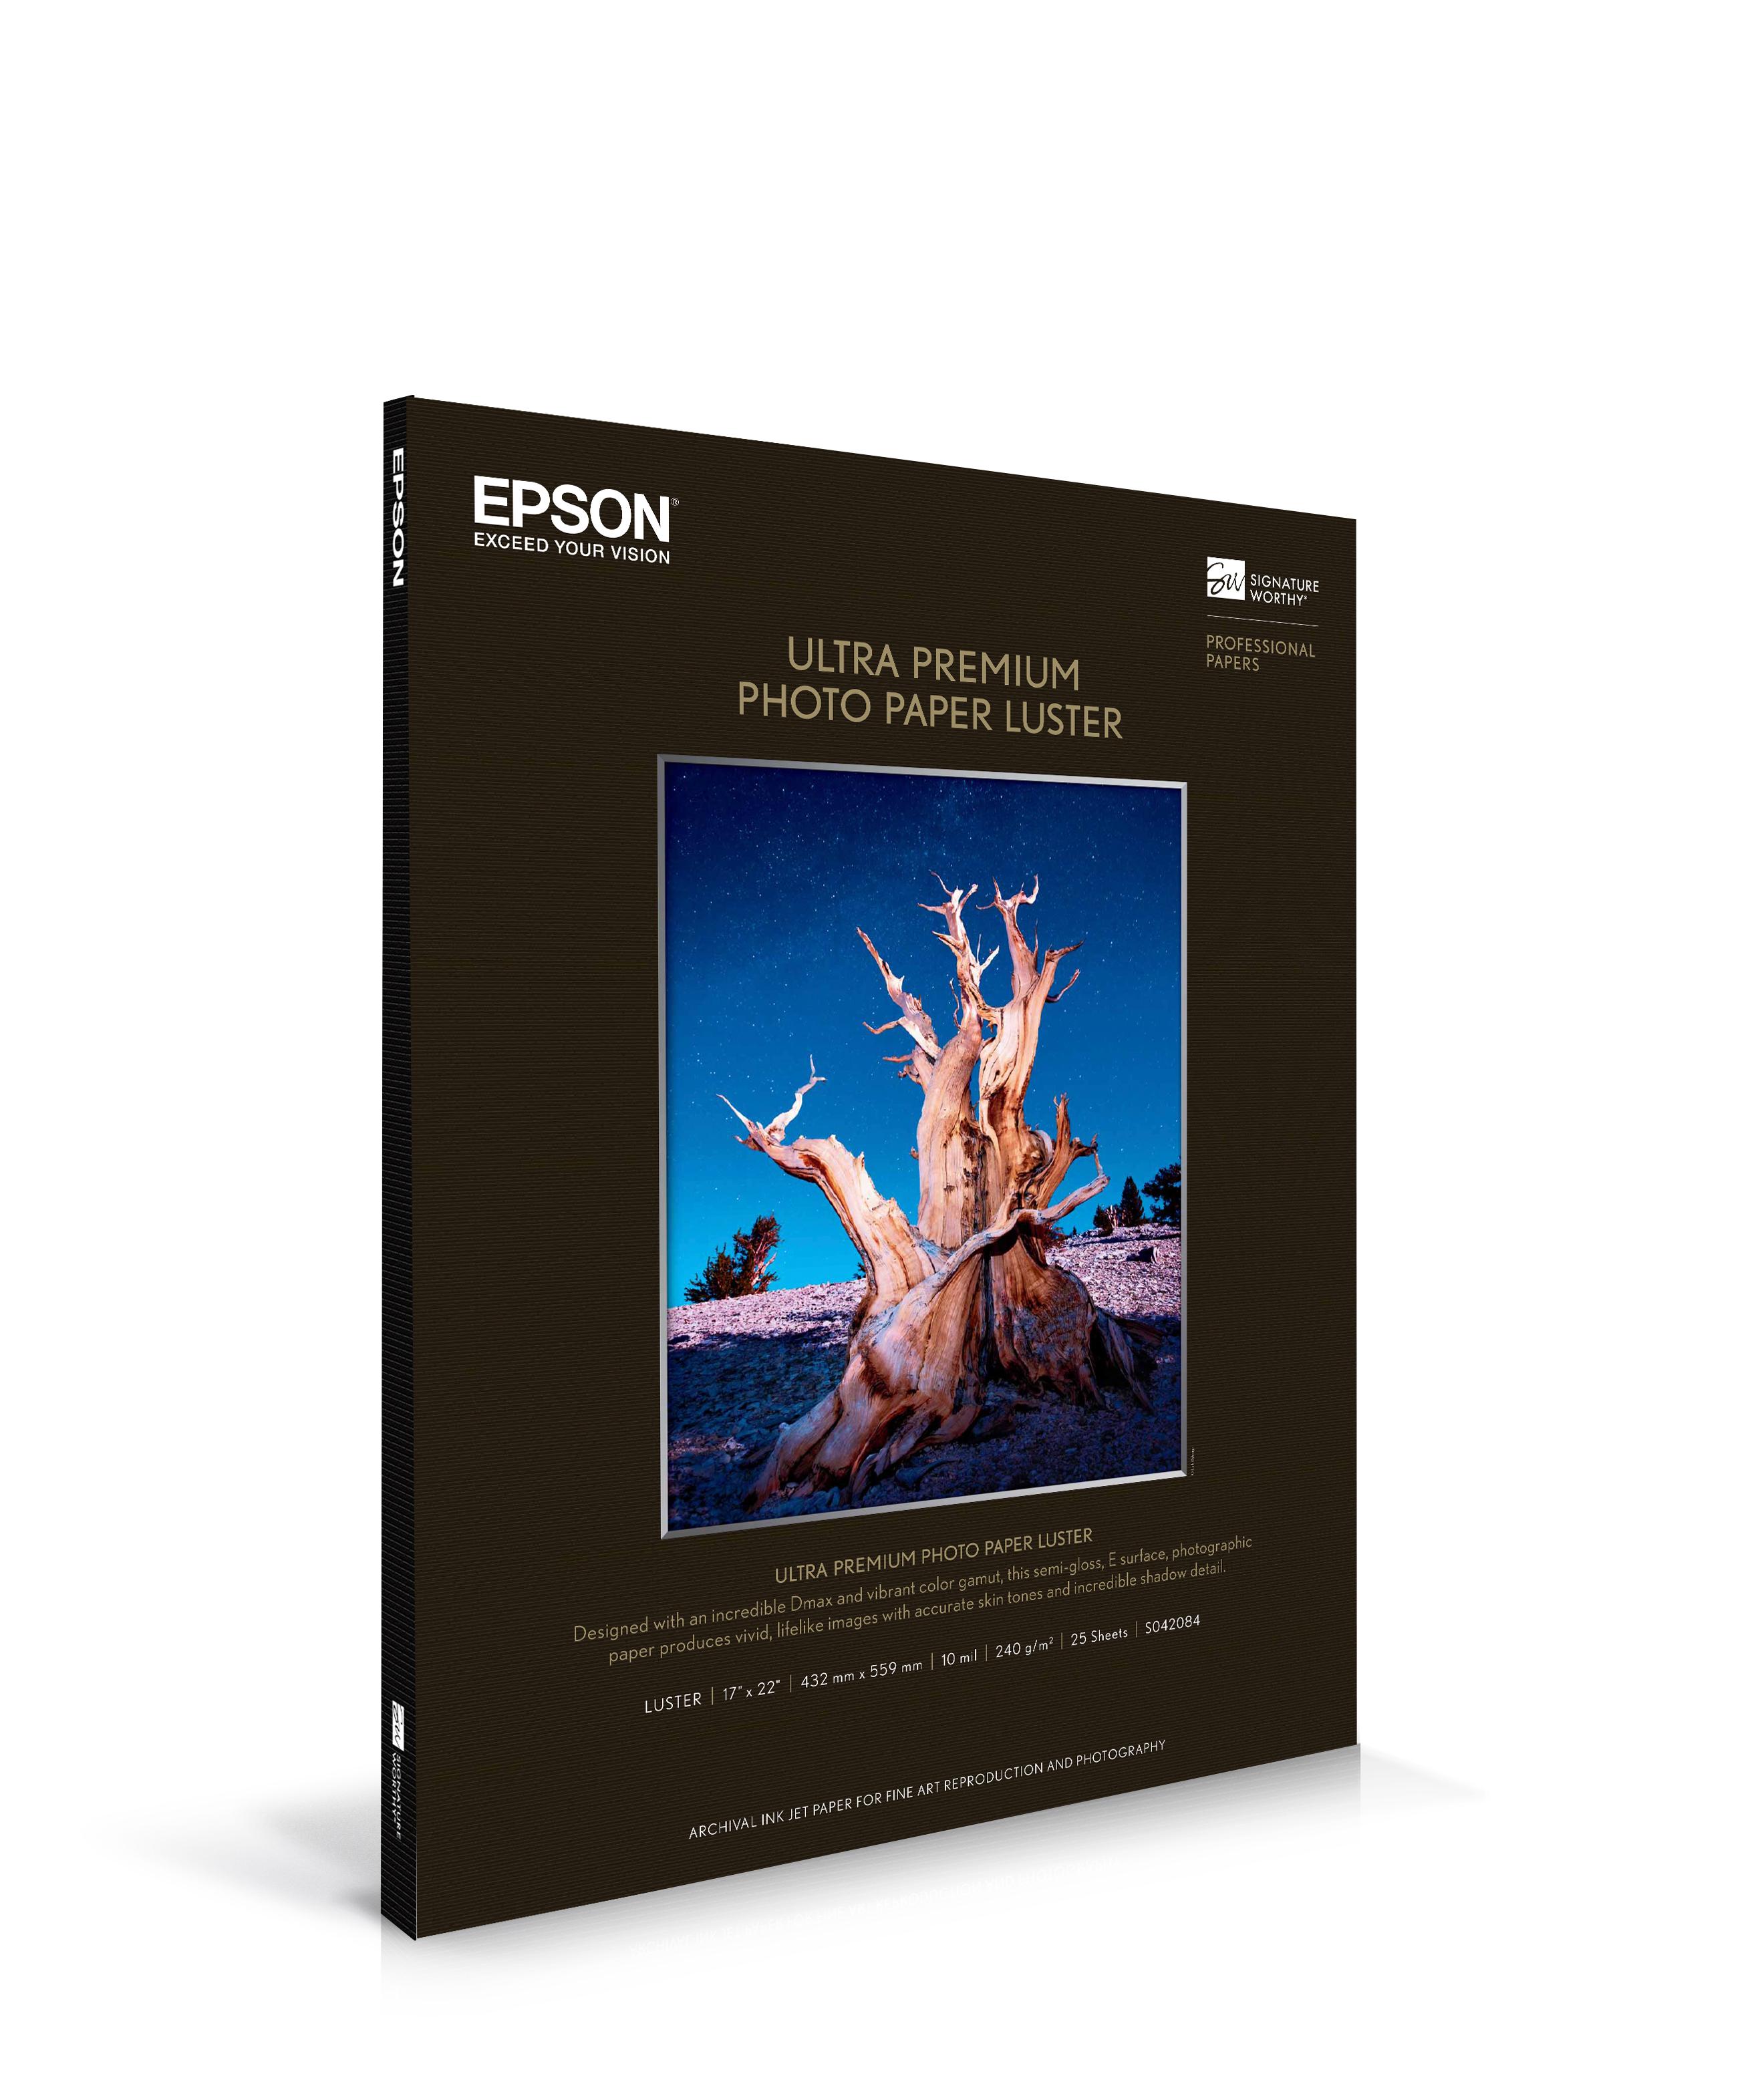 "Epson Ultra Premium Photo Paper Luster 17""x22""x25 sheets (S042084)"